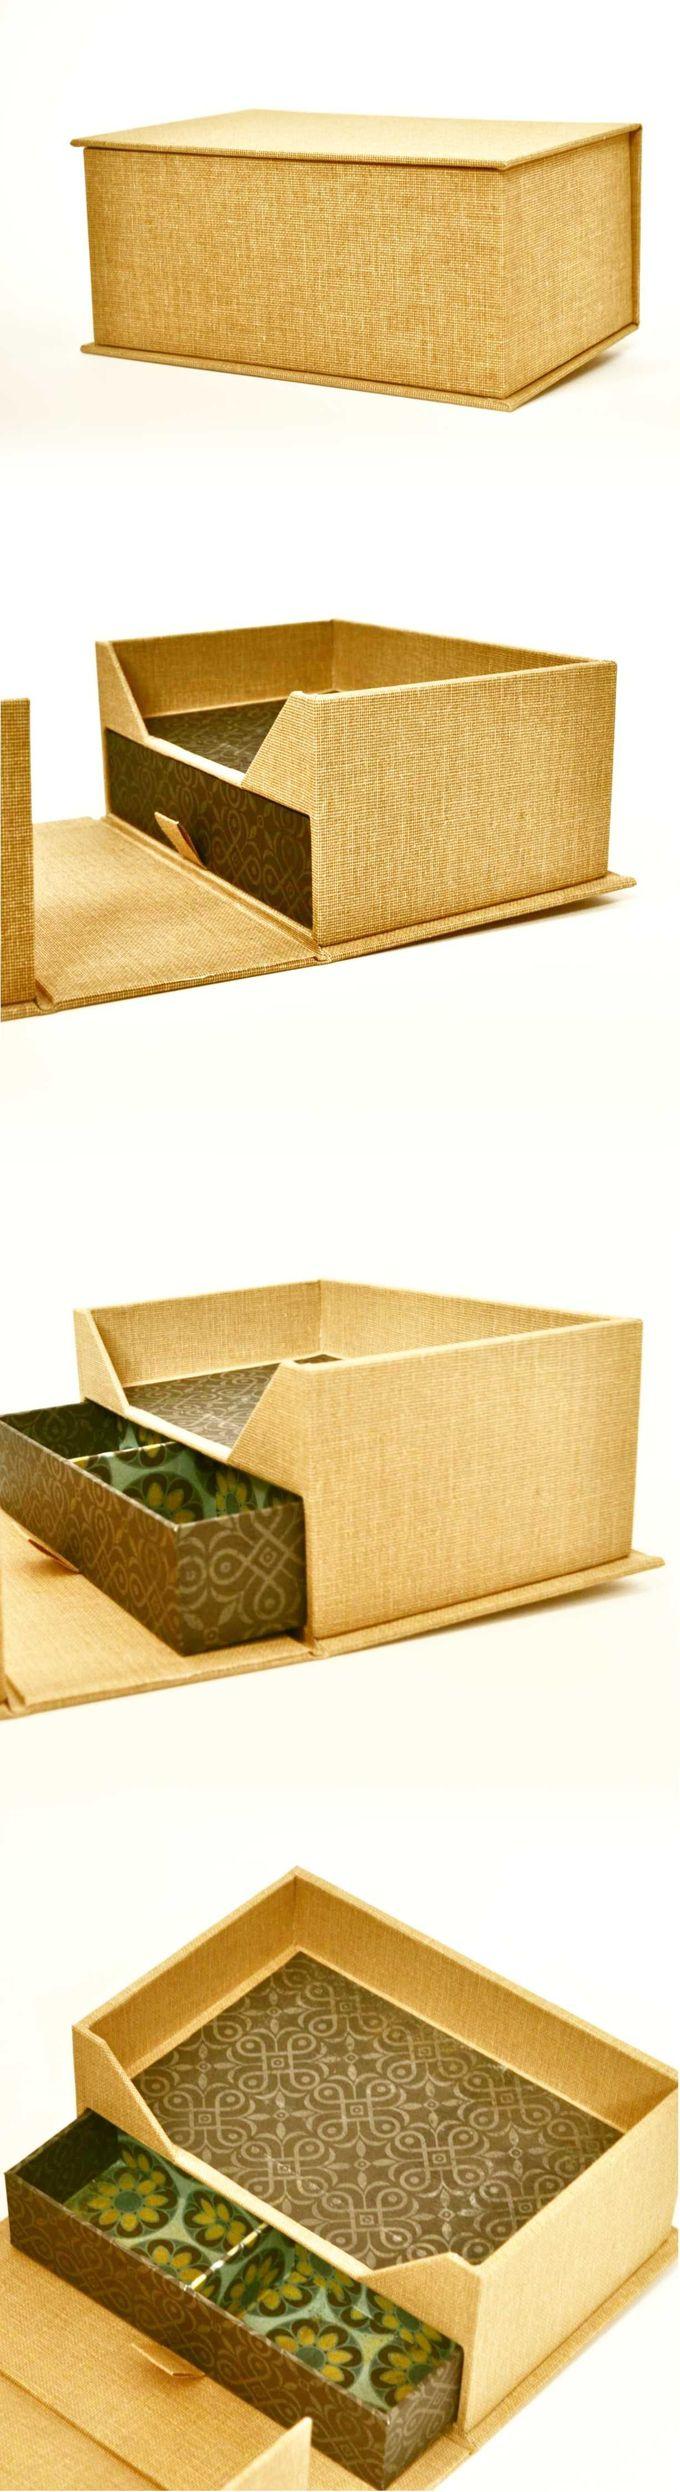 Clamshell Box.